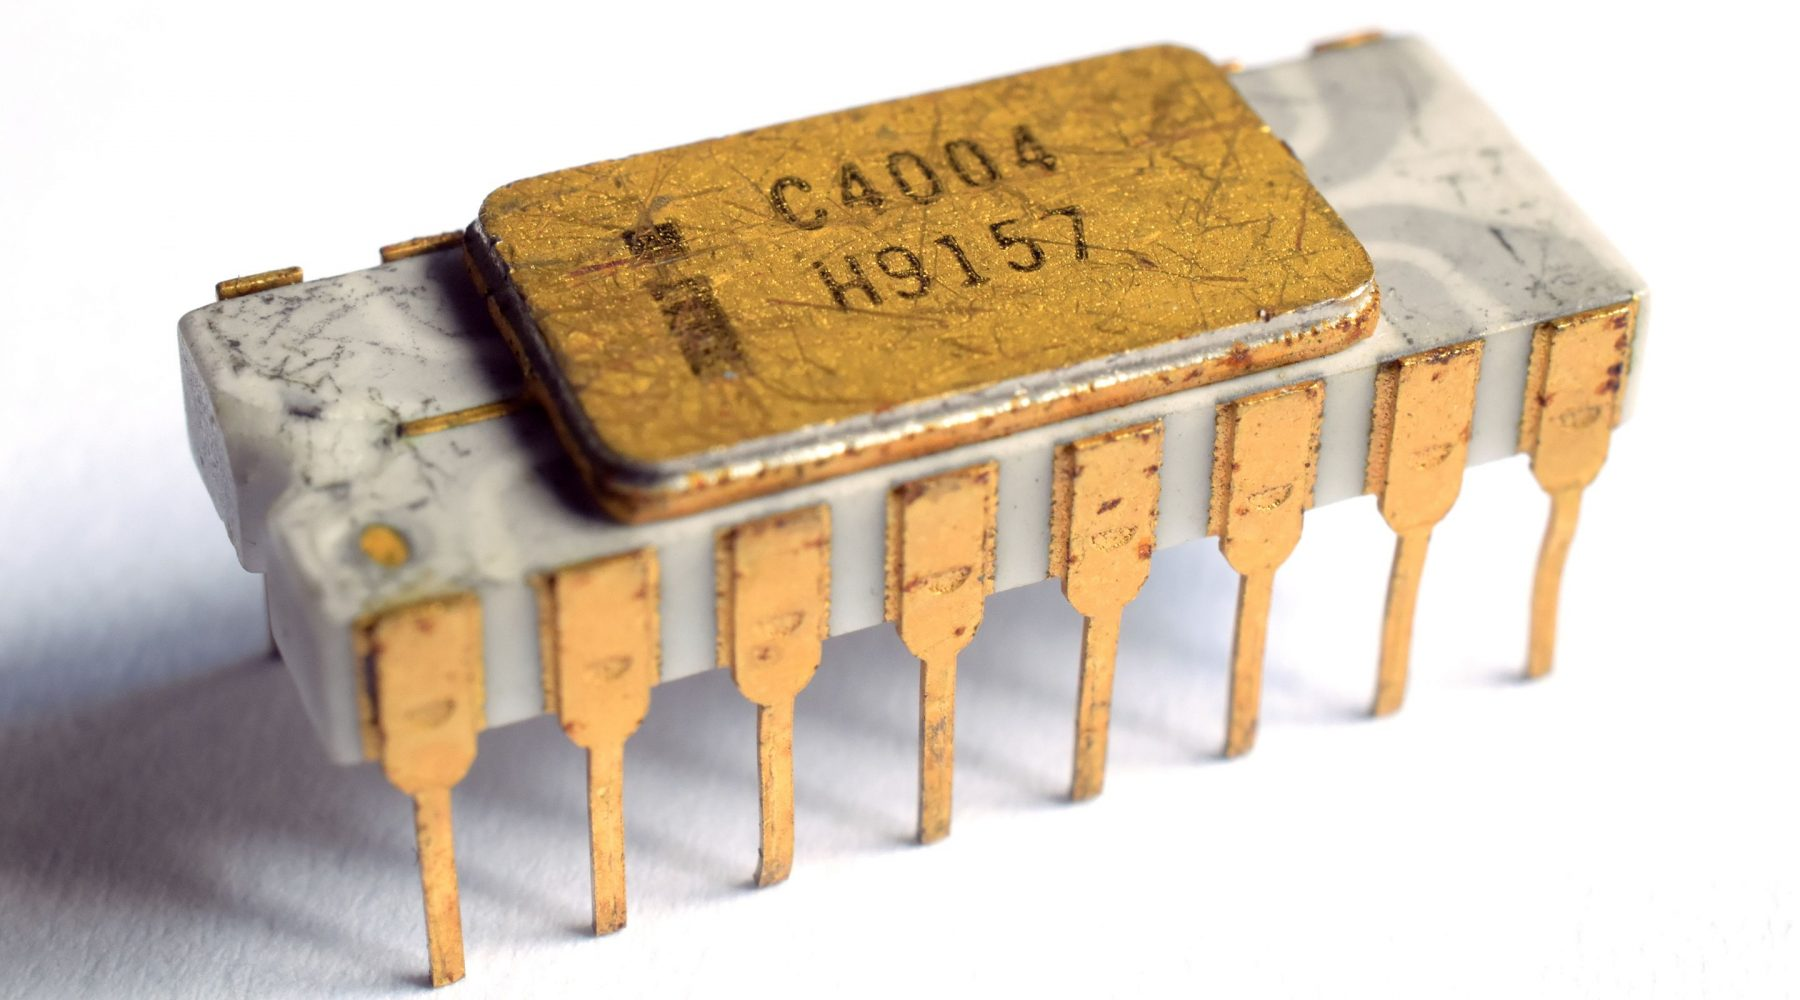 Celebrating the Microprocessors 50th Birthday